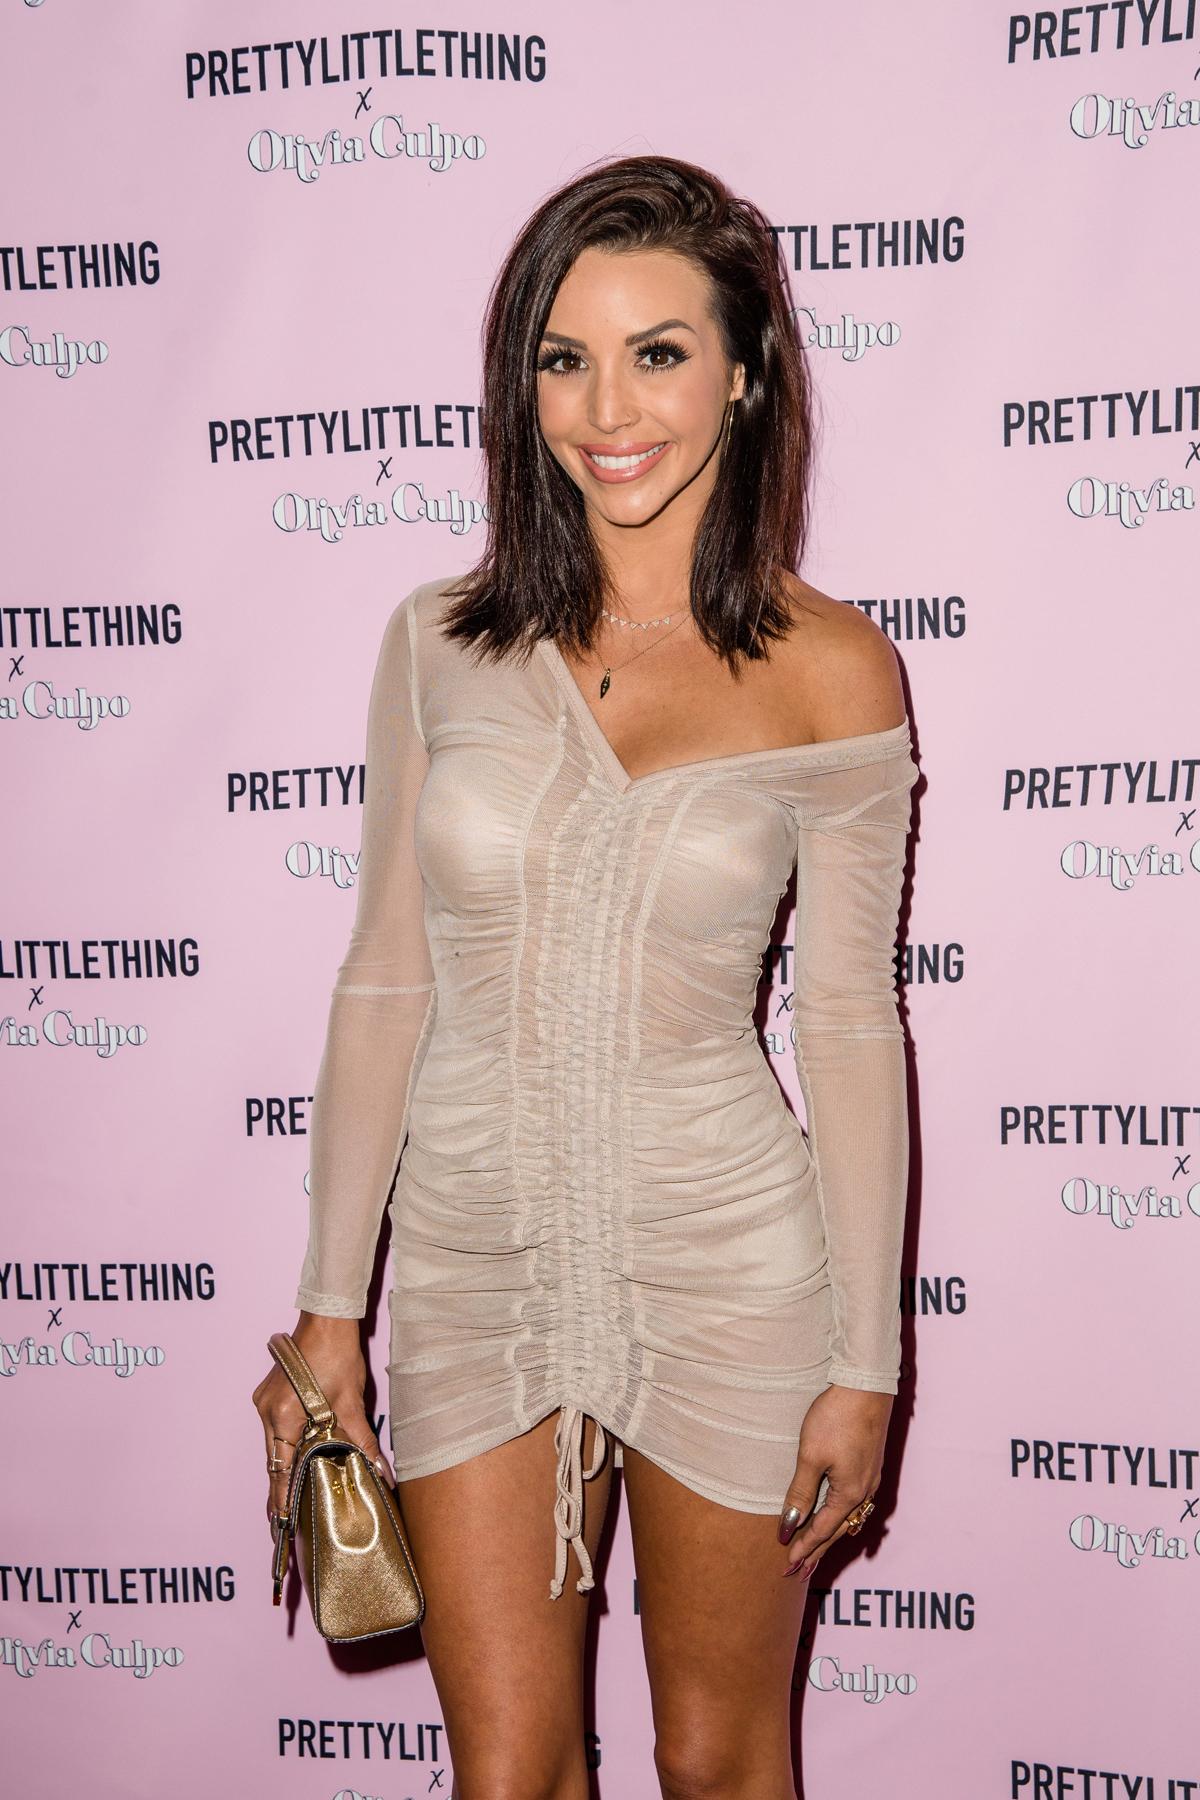 PrettyLittleThing PLT X Olivia Culpo Collection  Celebrity Launch Party Vanderpump Rules Scheana Marie.jpg